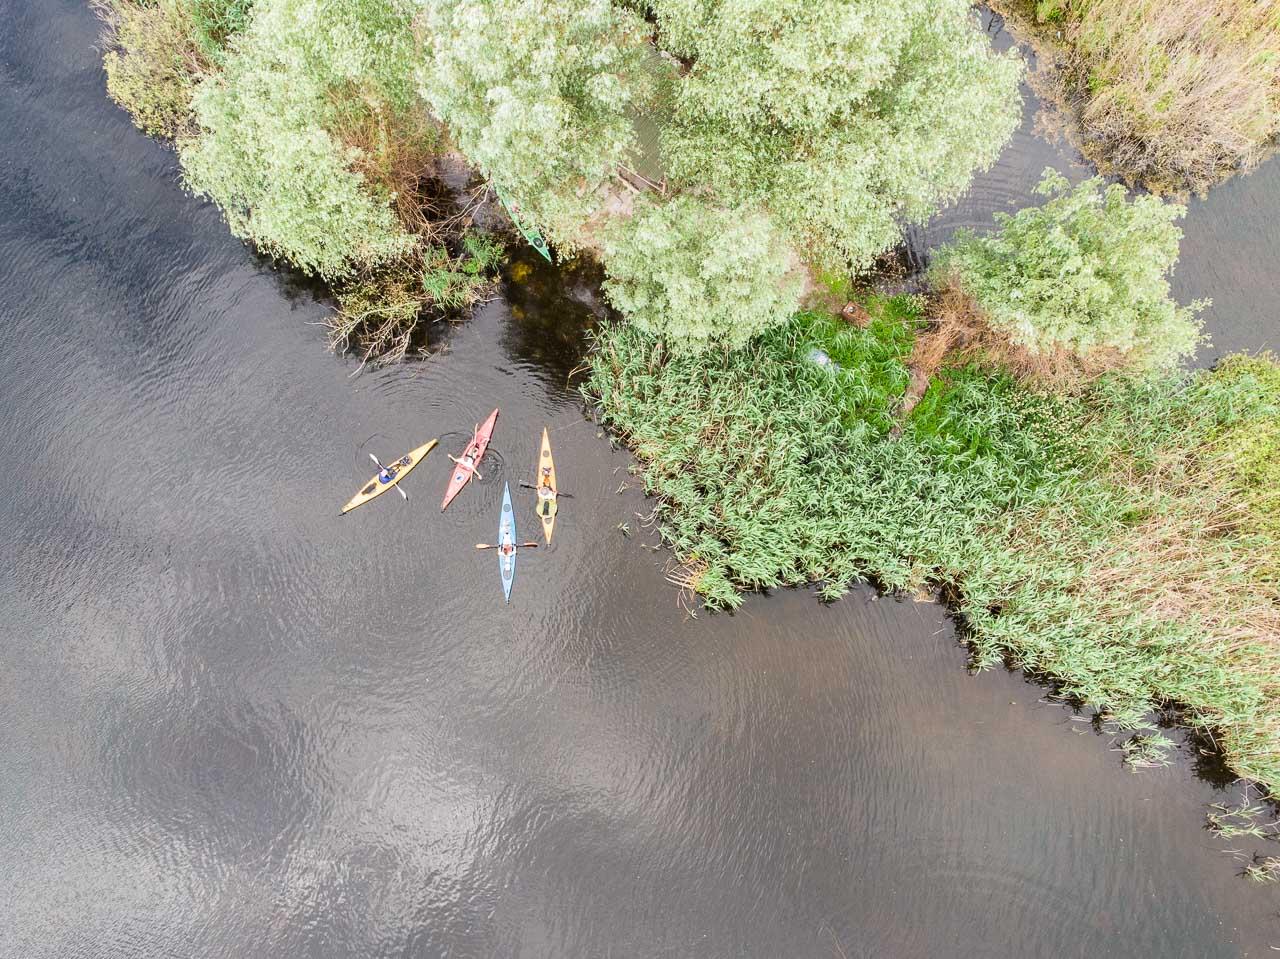 delta dunarii caiac barca fotograf ionescu vlad